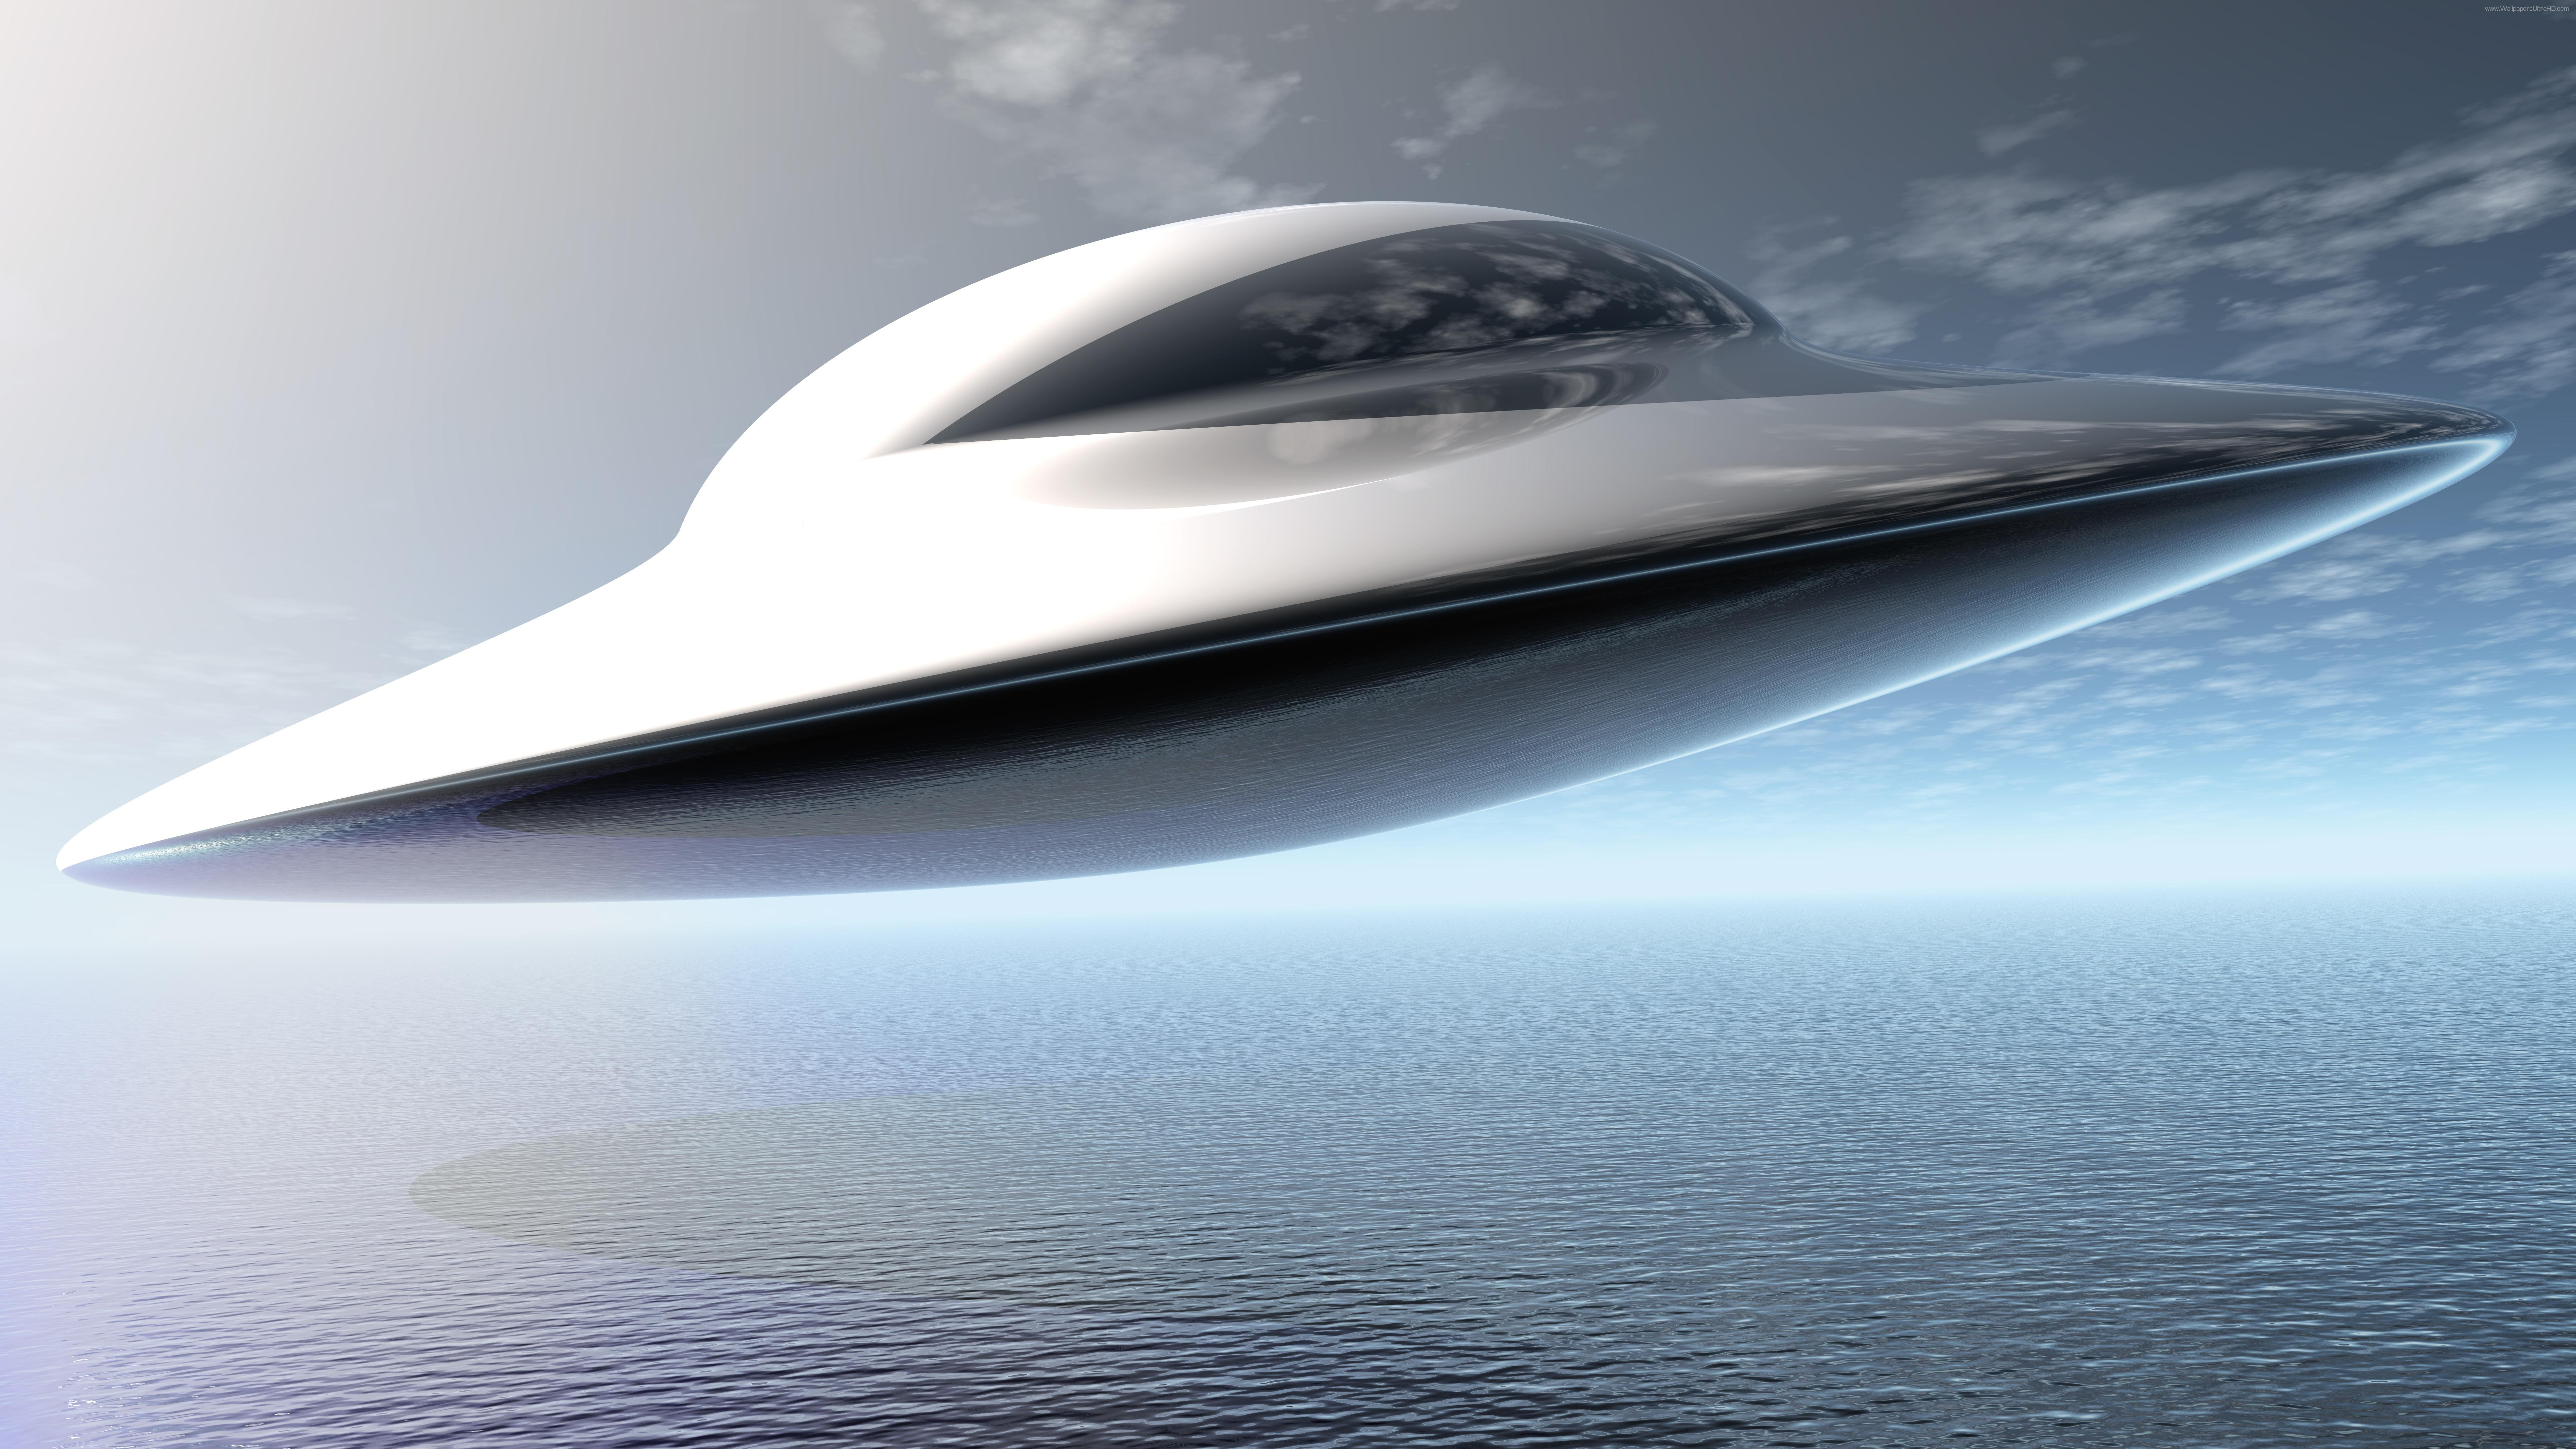 Flying saucer wallpaper